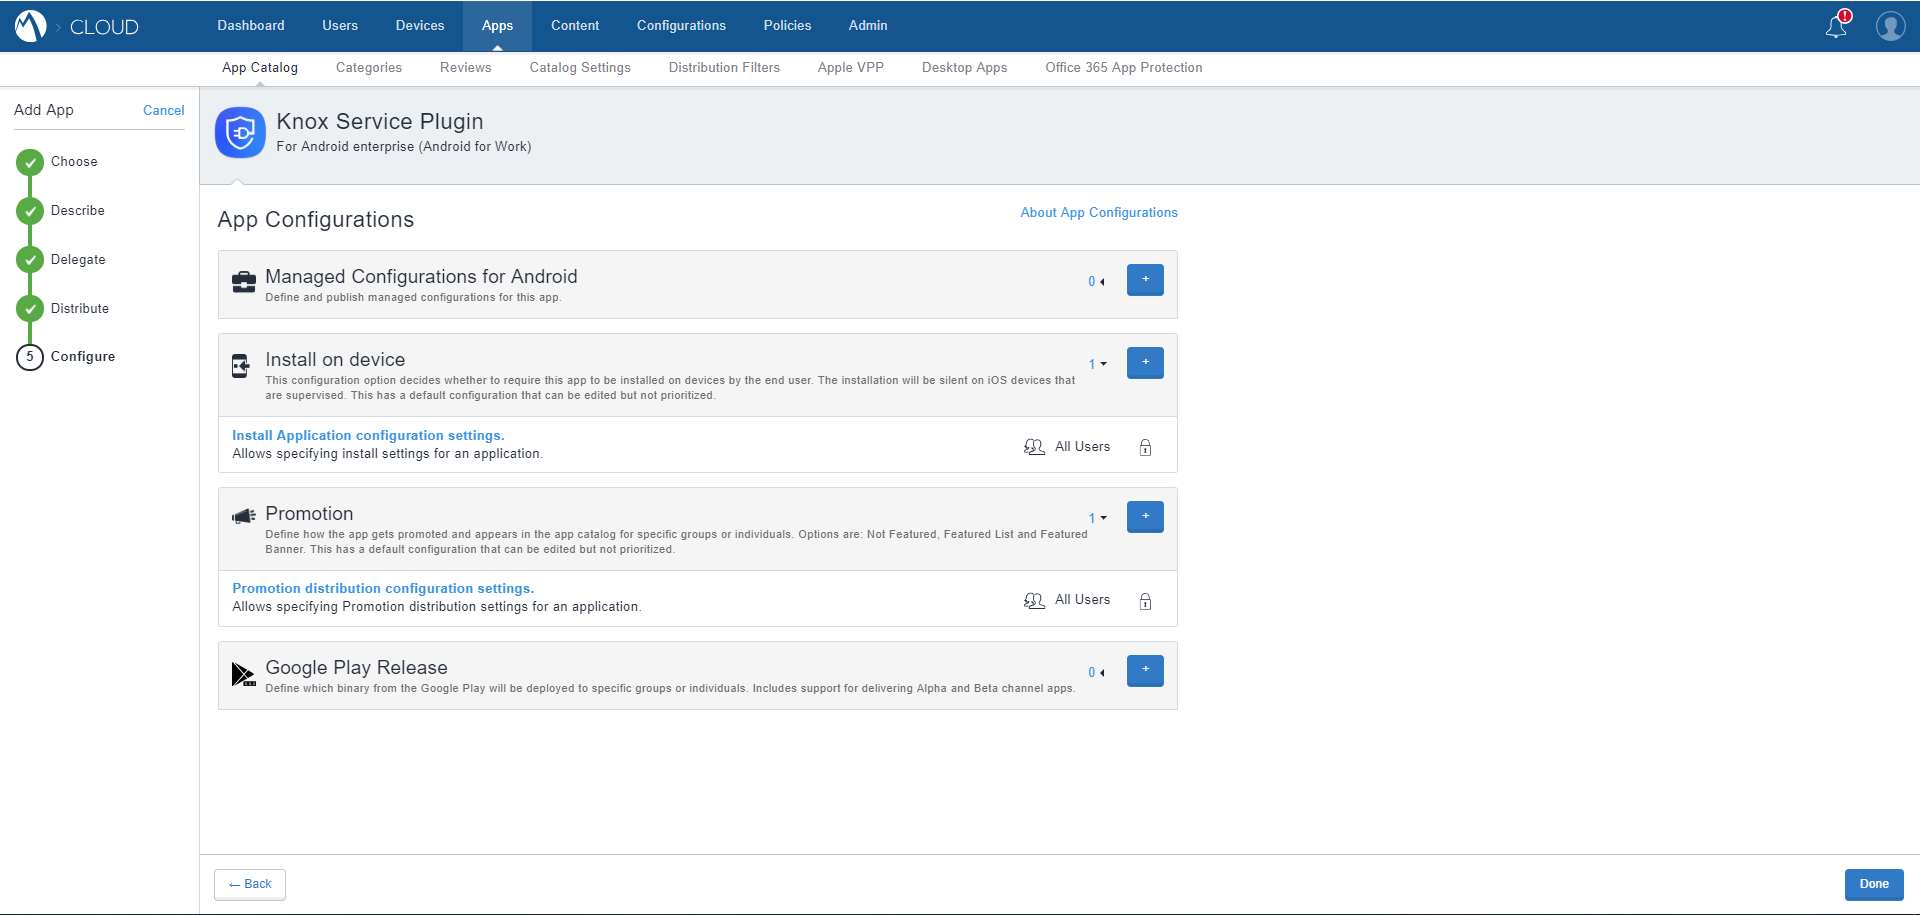 MobileIron Cloud App Catalog - Knox Service Plugin - Configure App page